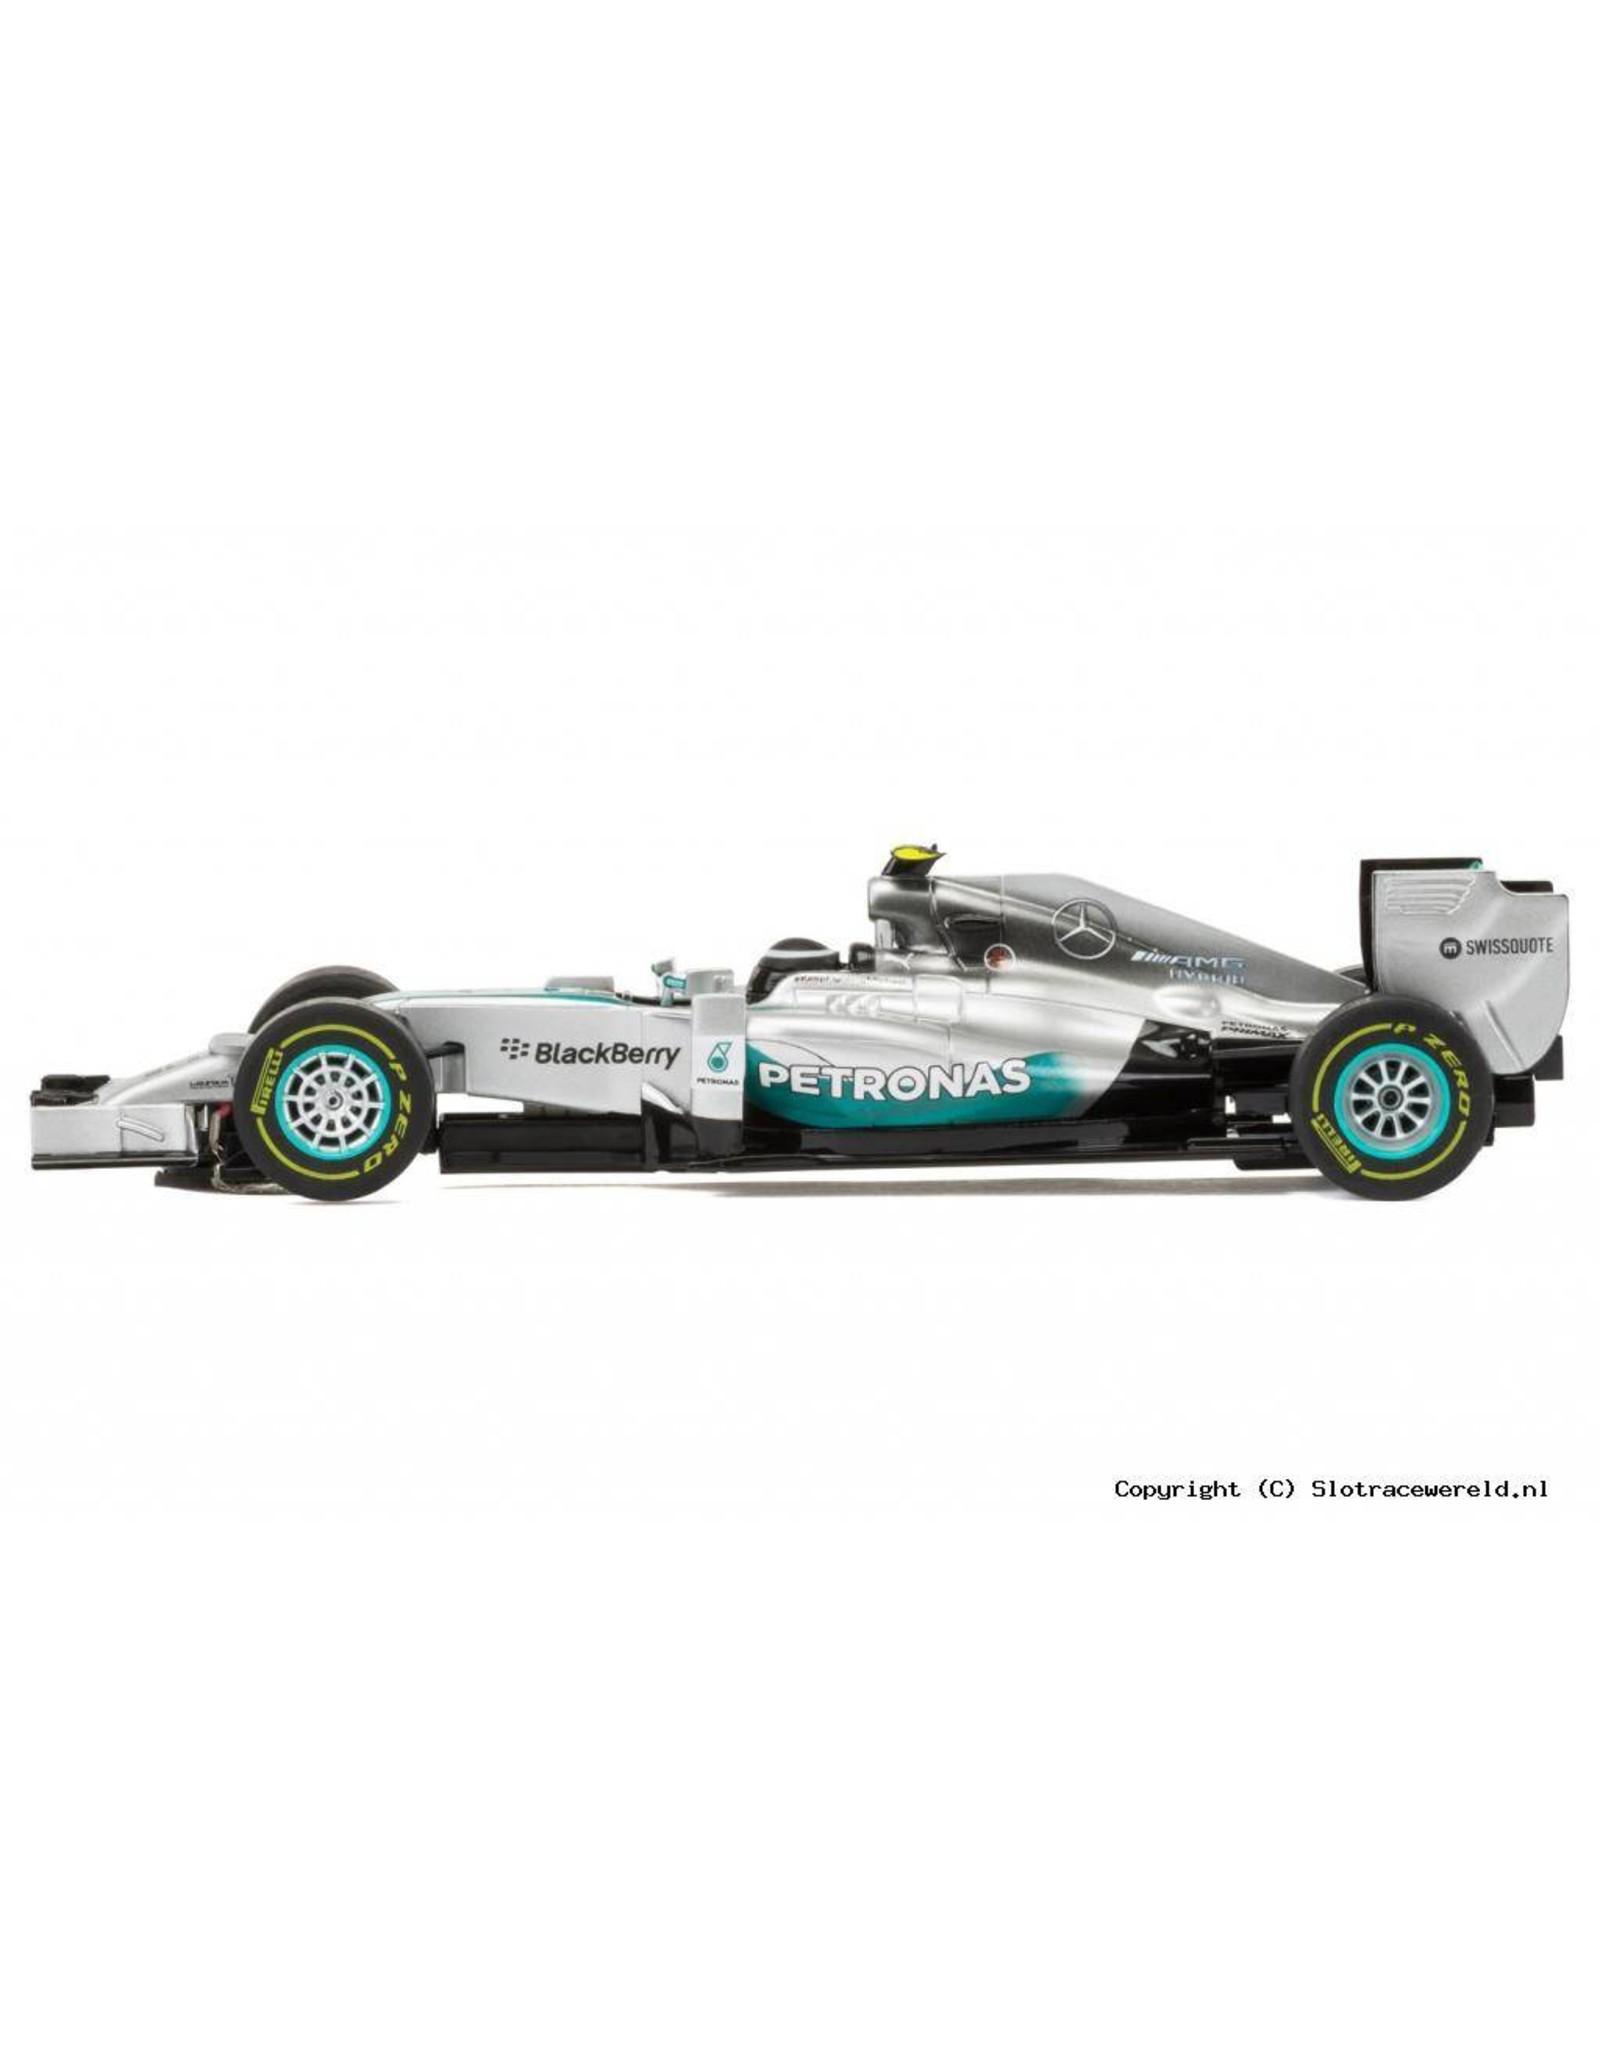 Scalextric Mercedes F1 W05 Hybrid Nico Rosberg (2014) - 1:32 - Scalextric